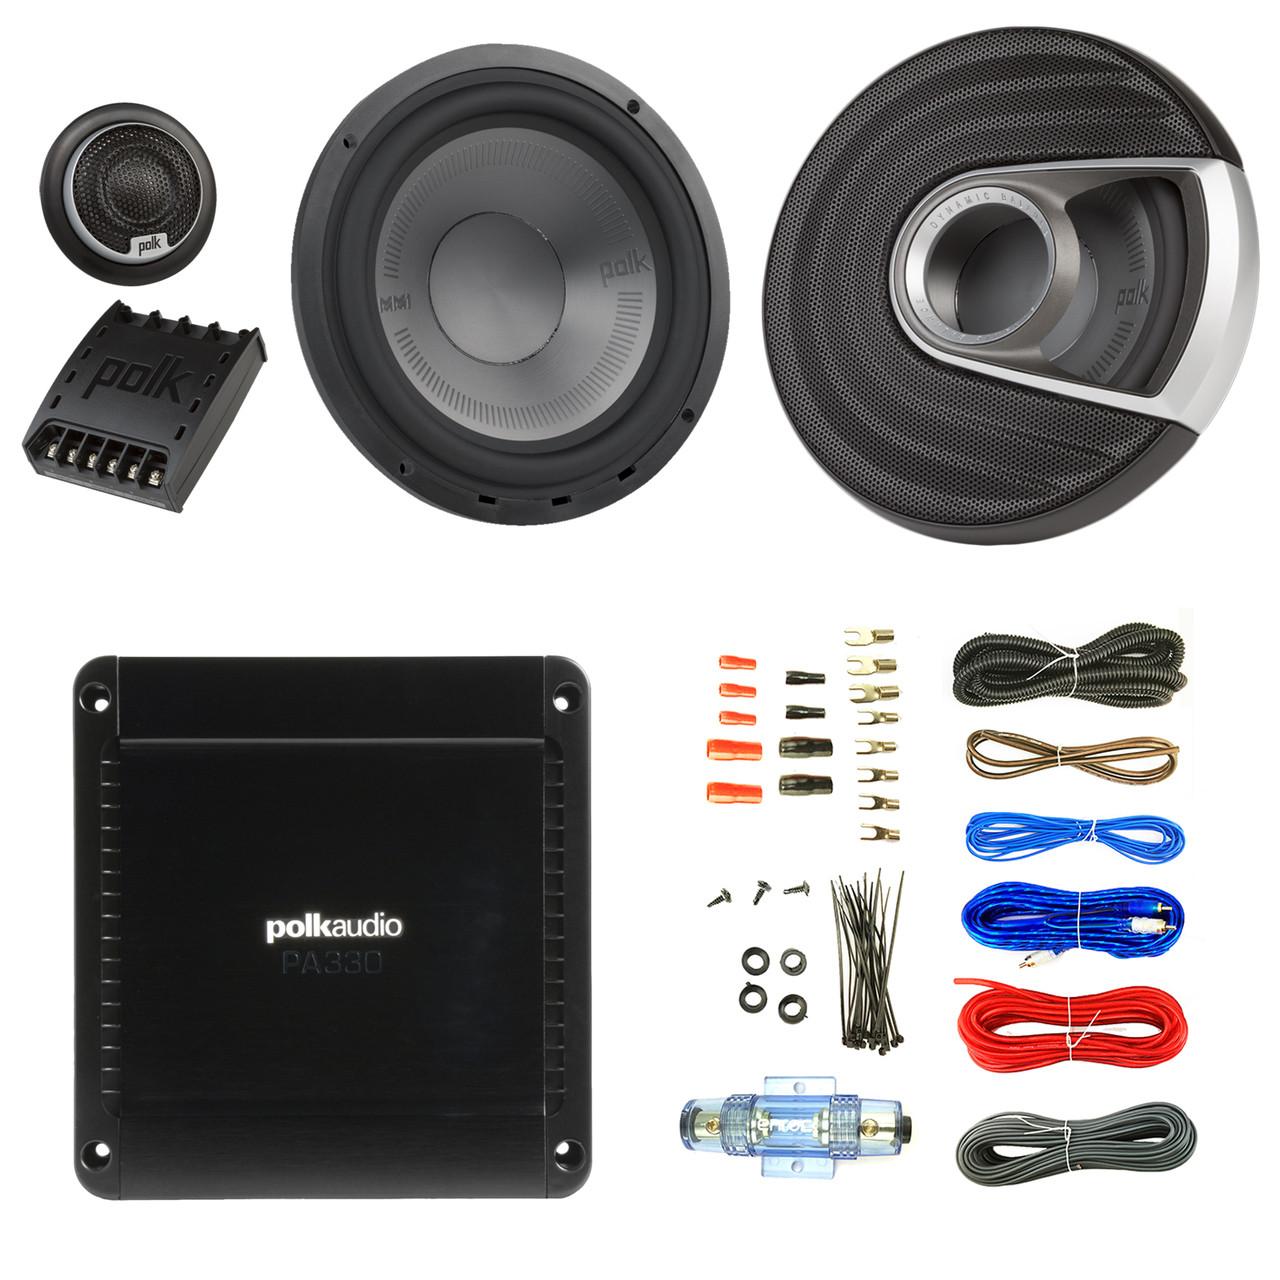 hight resolution of 2x polk audio mm1 mm6502 series 375w ultra marine certified 6 5 component speaker system pa330 330w 2 channel car amplifier enrock audio 16 gauge 50 foot